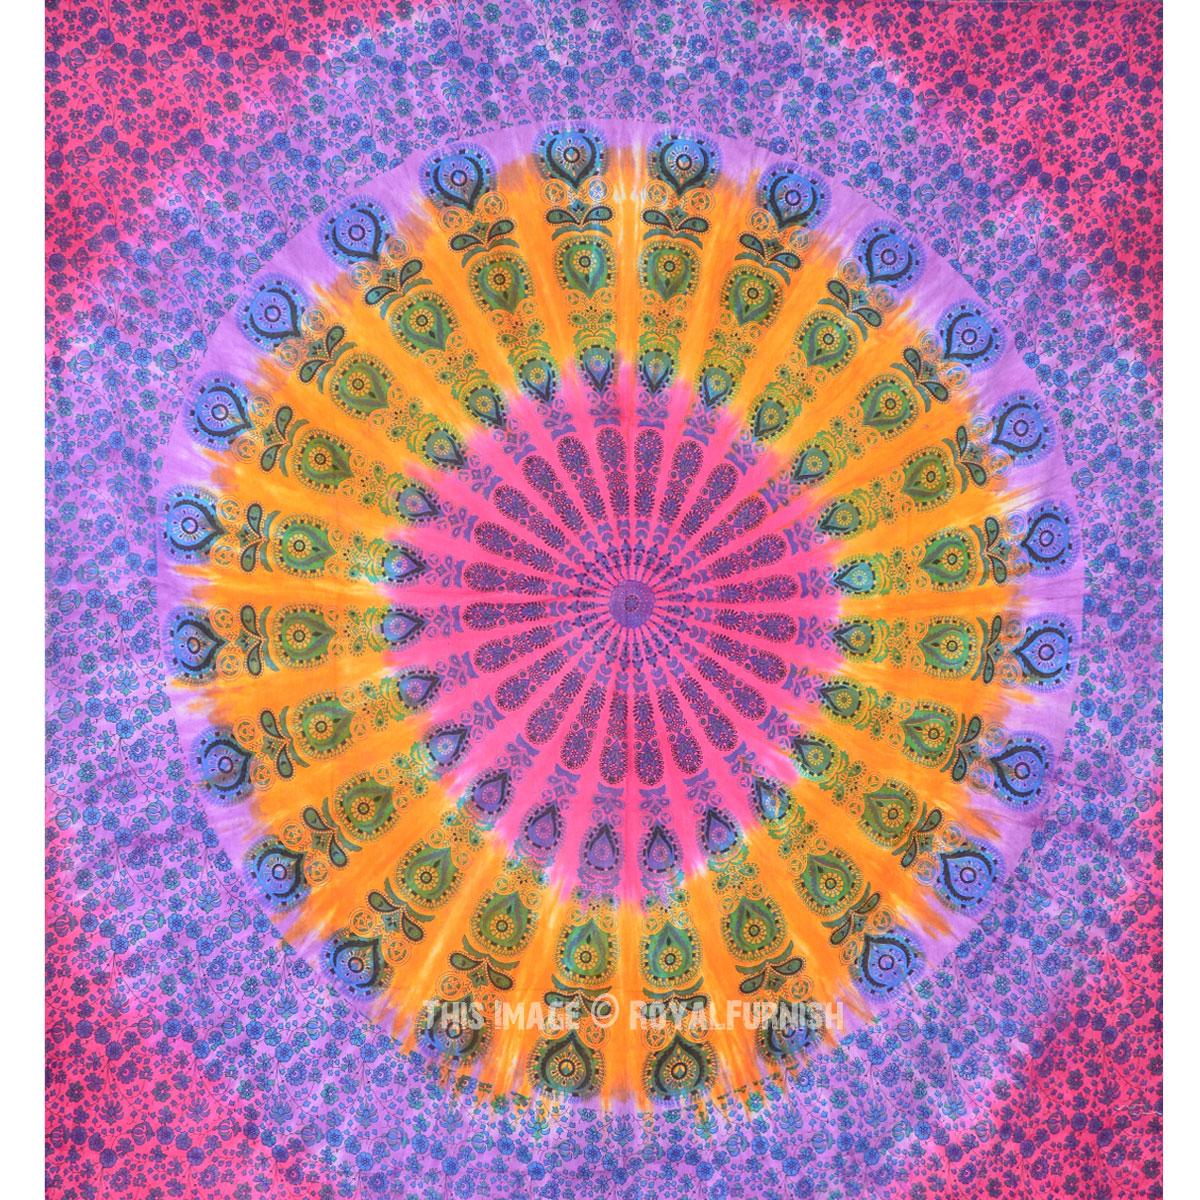 Mandala Tie Dye Tapestry Wall Hanging Bed Sheet